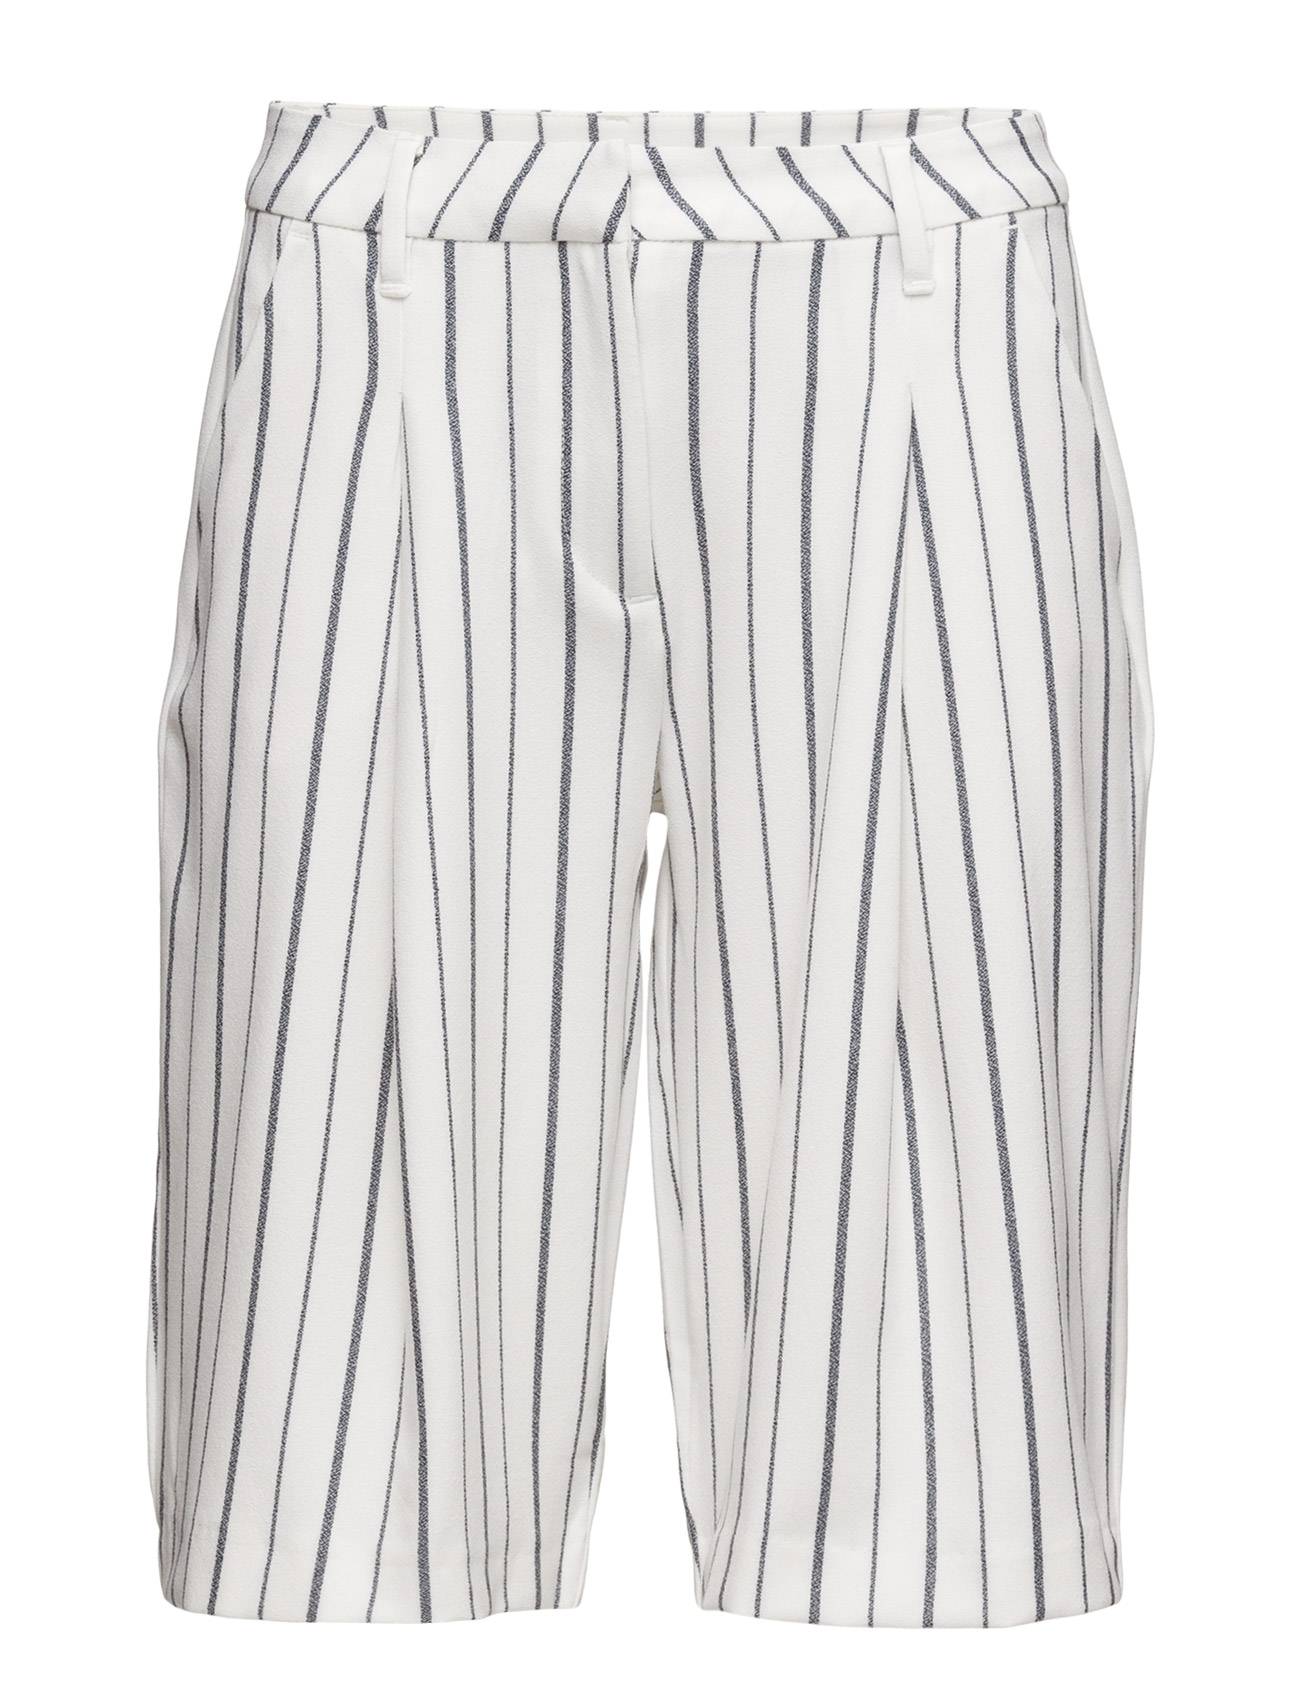 Vilma 391 Stripe Chillax, Shorts FIVEUNITS  til Kvinder i